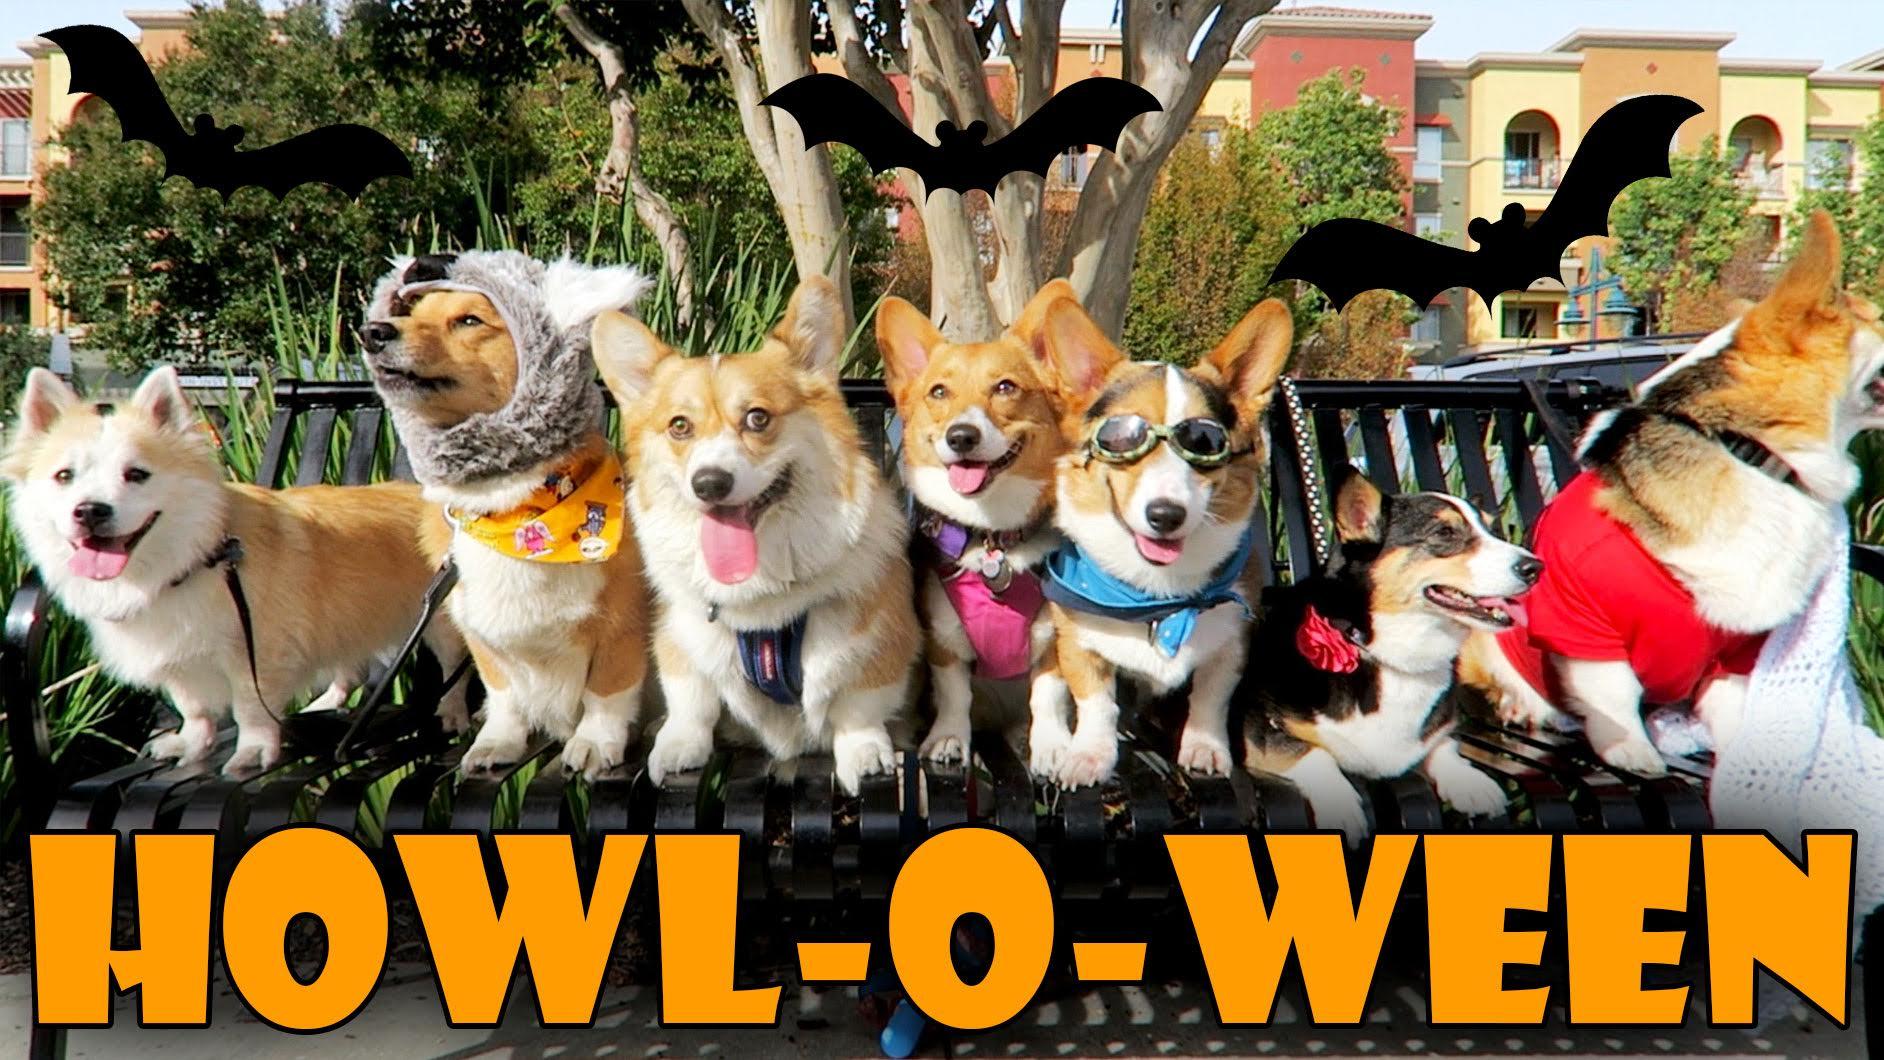 HALLOWEEN DOG COSTUME PARTY for CORGIS